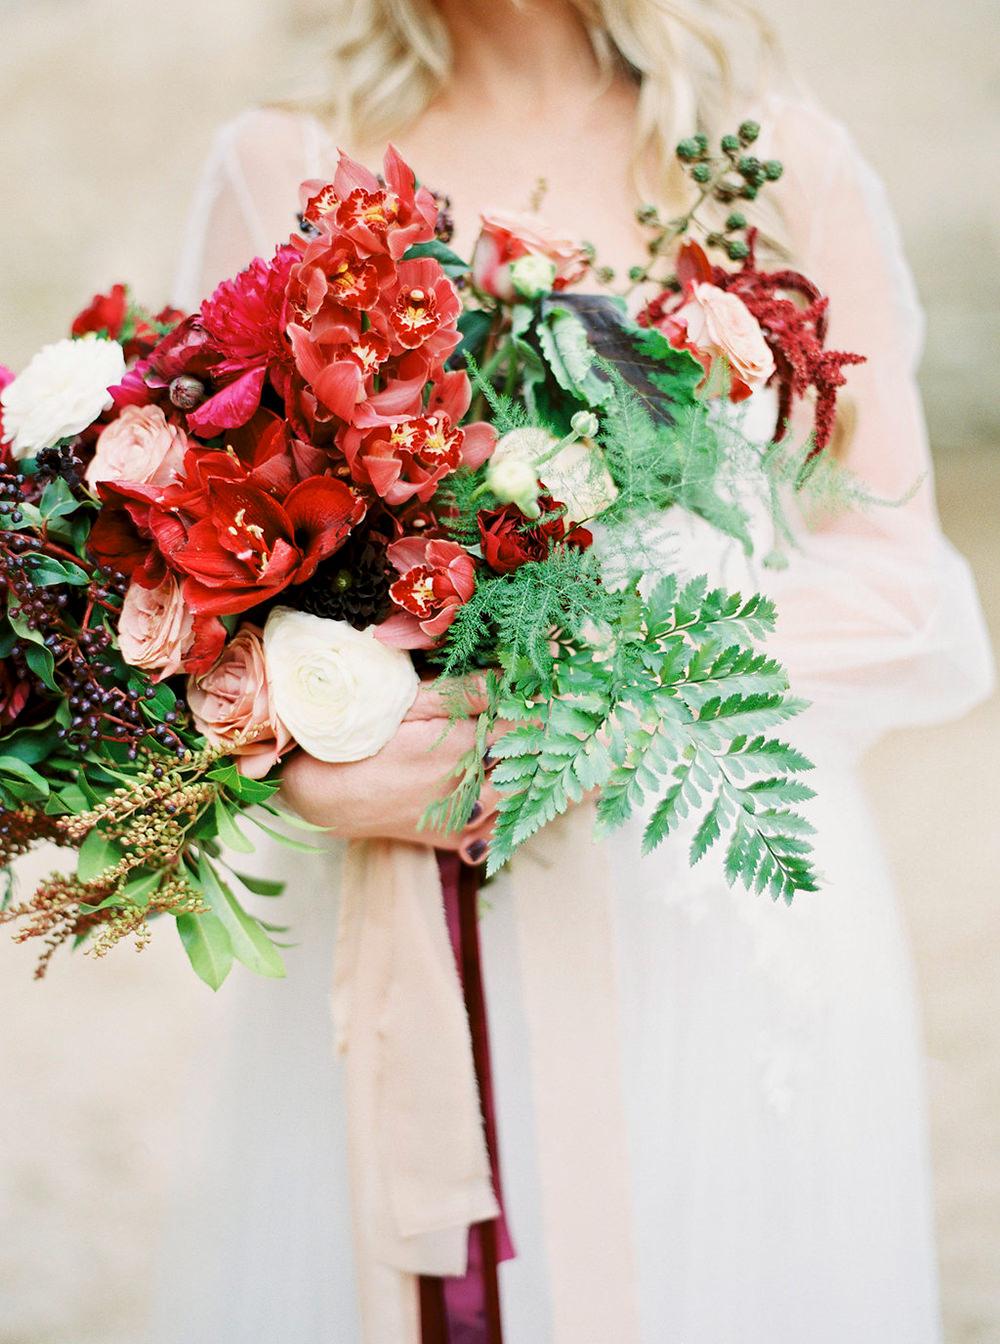 organic wedding bouquets - photo by Amanda Lenhardt http://ruffledblog.com/relaxed-san-juan-capistrano-wedding-inspiration